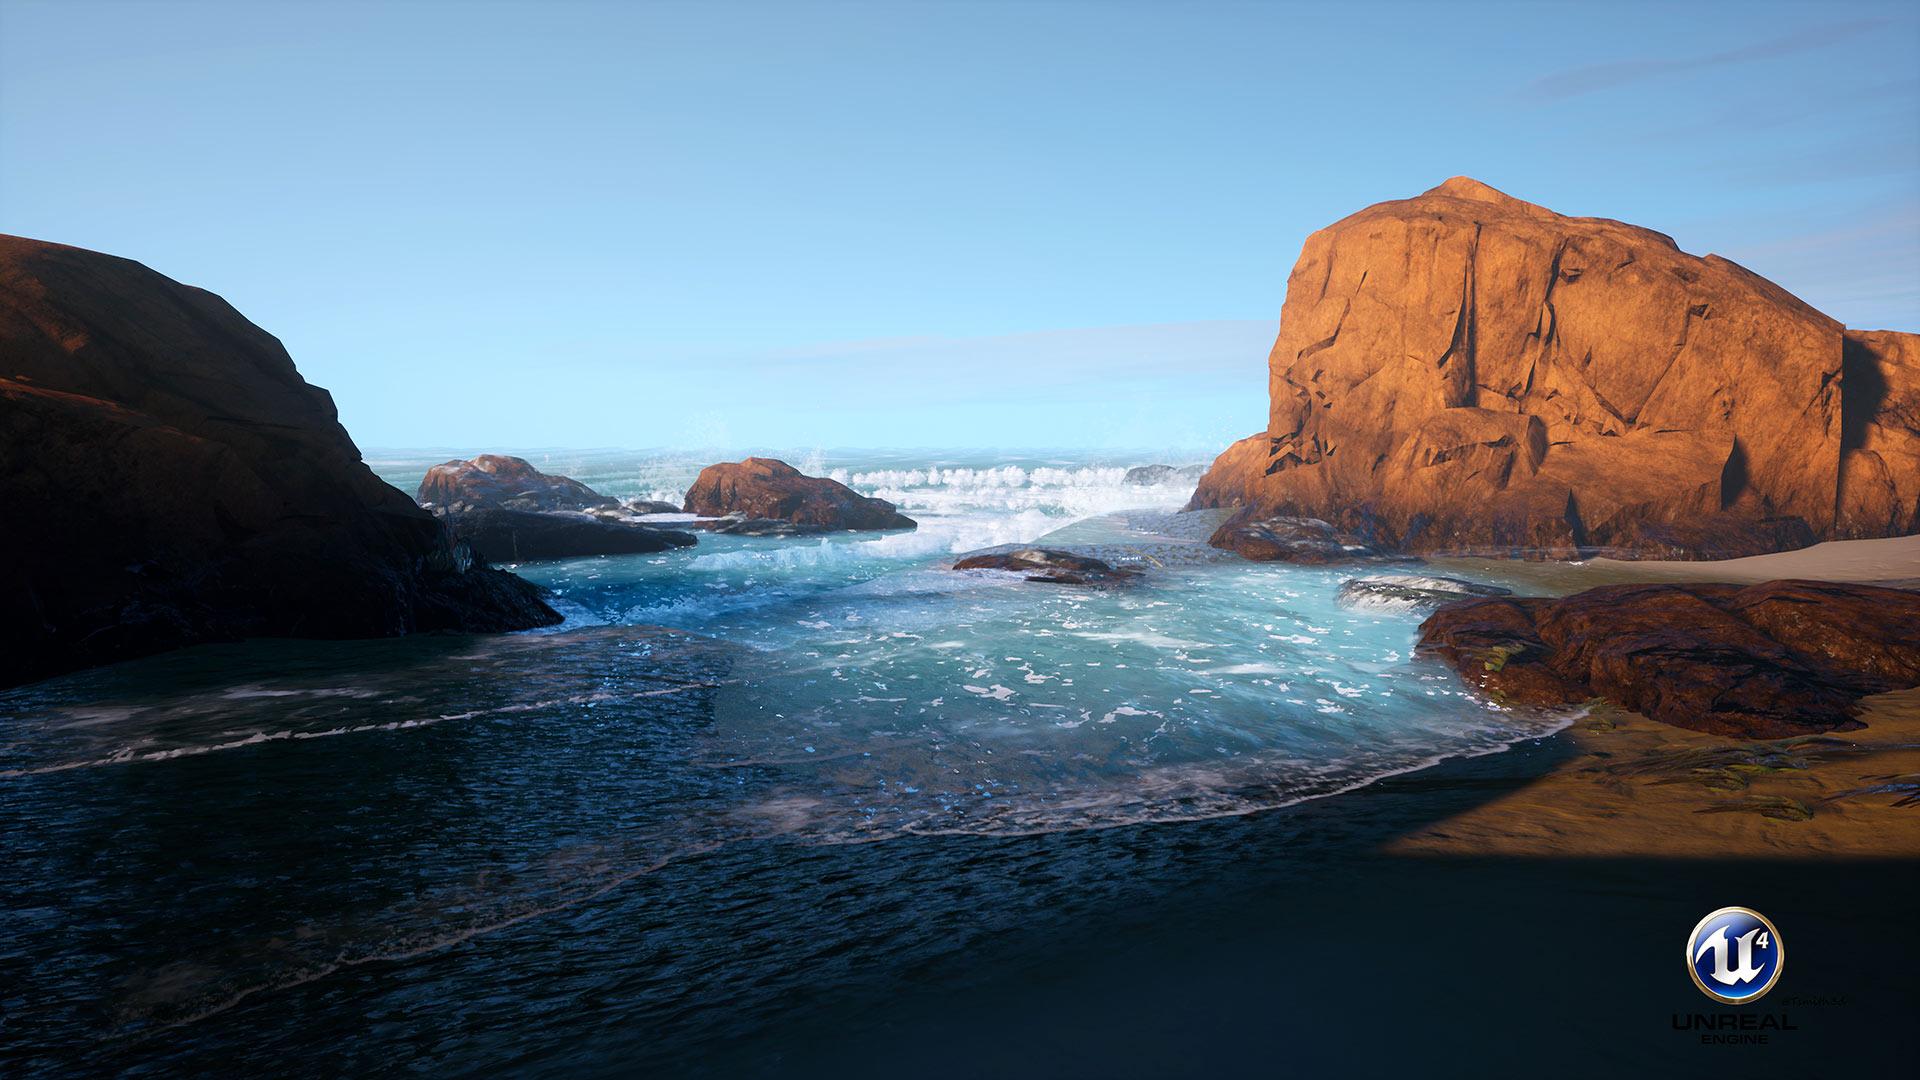 Creating a Realistic Ocean in UE4 | FlippedNormals - Bob Tomson; By Bob Tomson